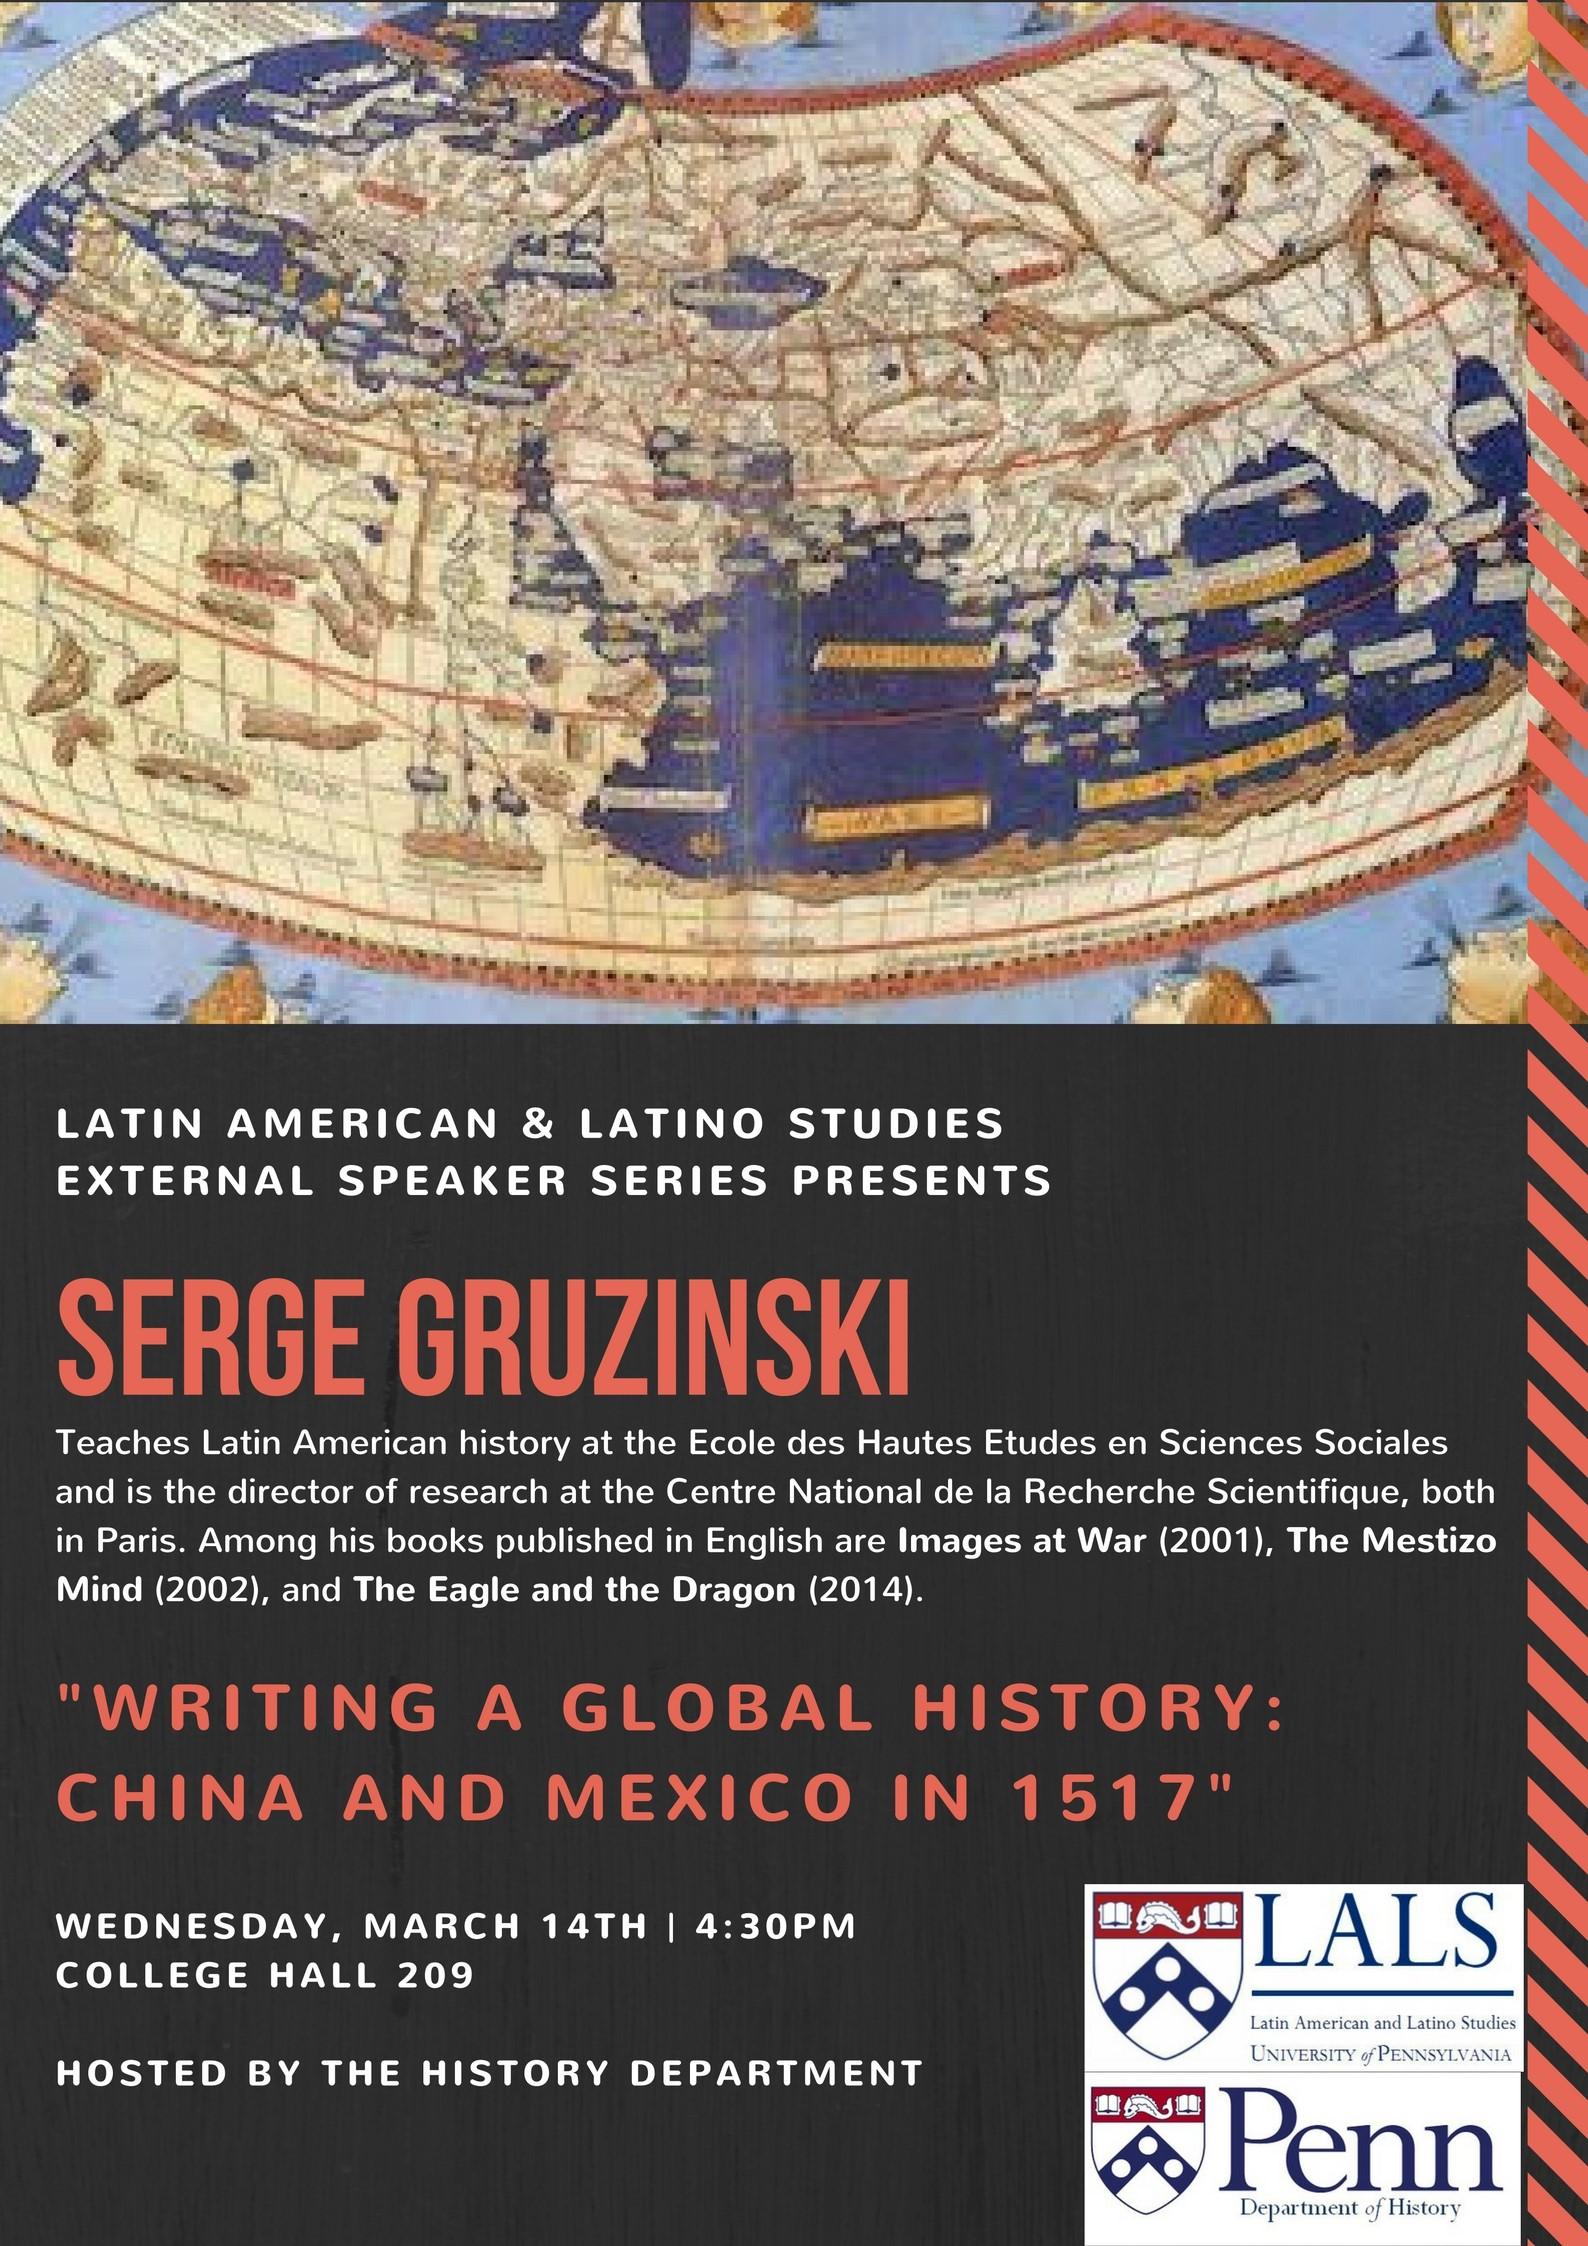 Latin American & Latino Studies External Speakers Series